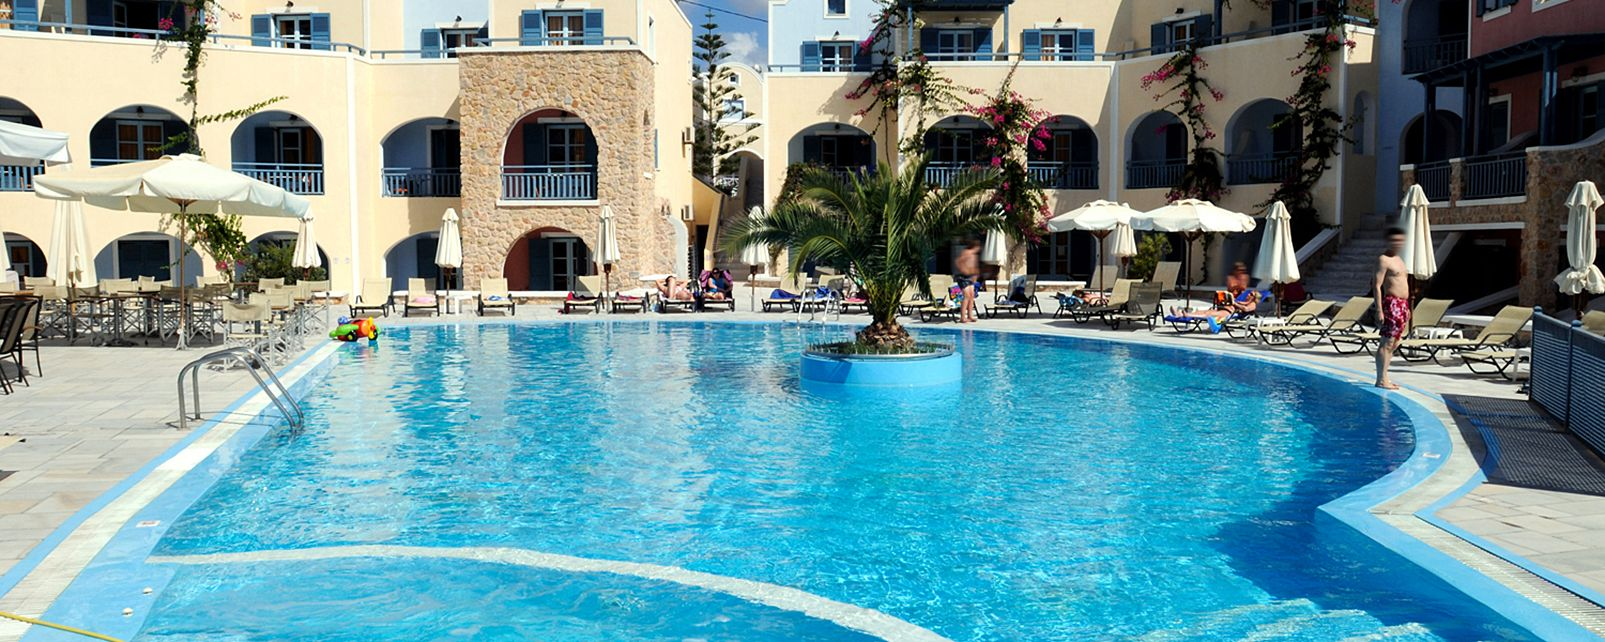 Hôtel Aegean Plaza